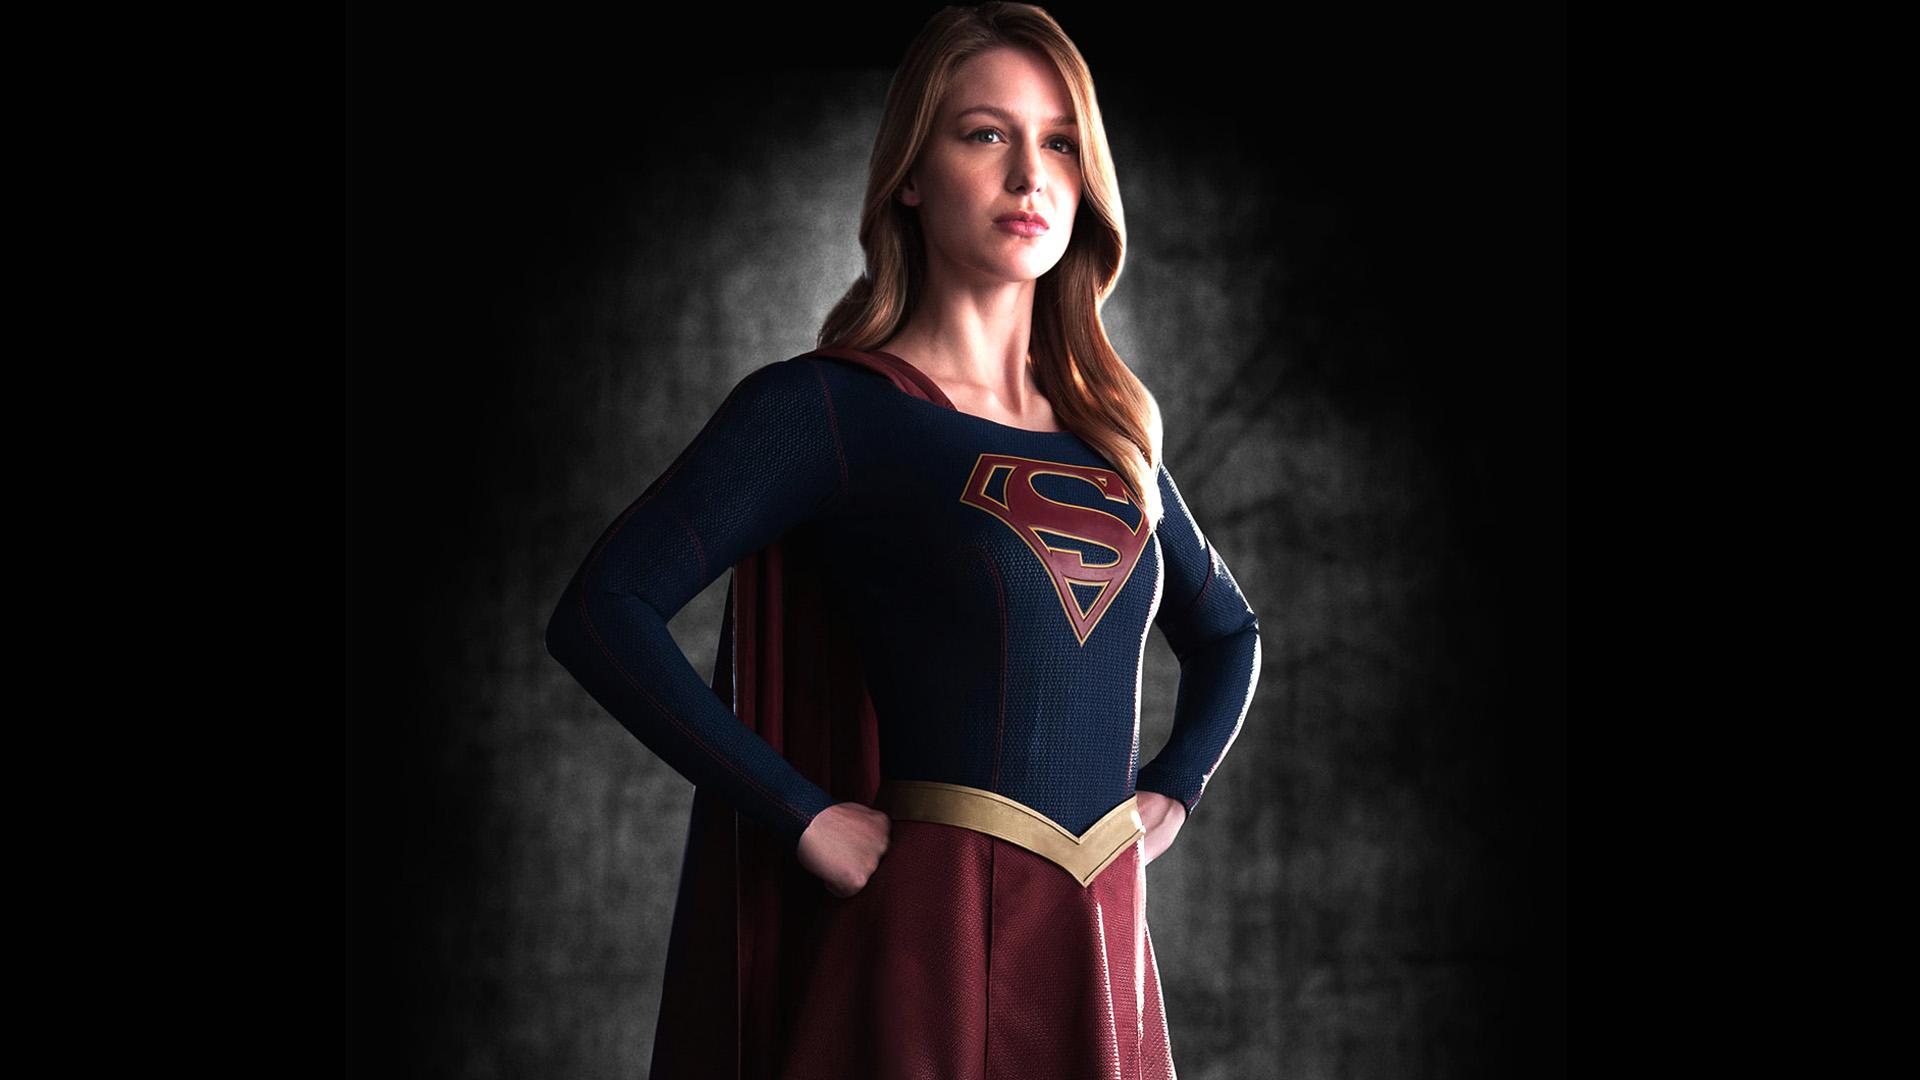 21+ Supergirl Wallpaper Season 5 Pictures